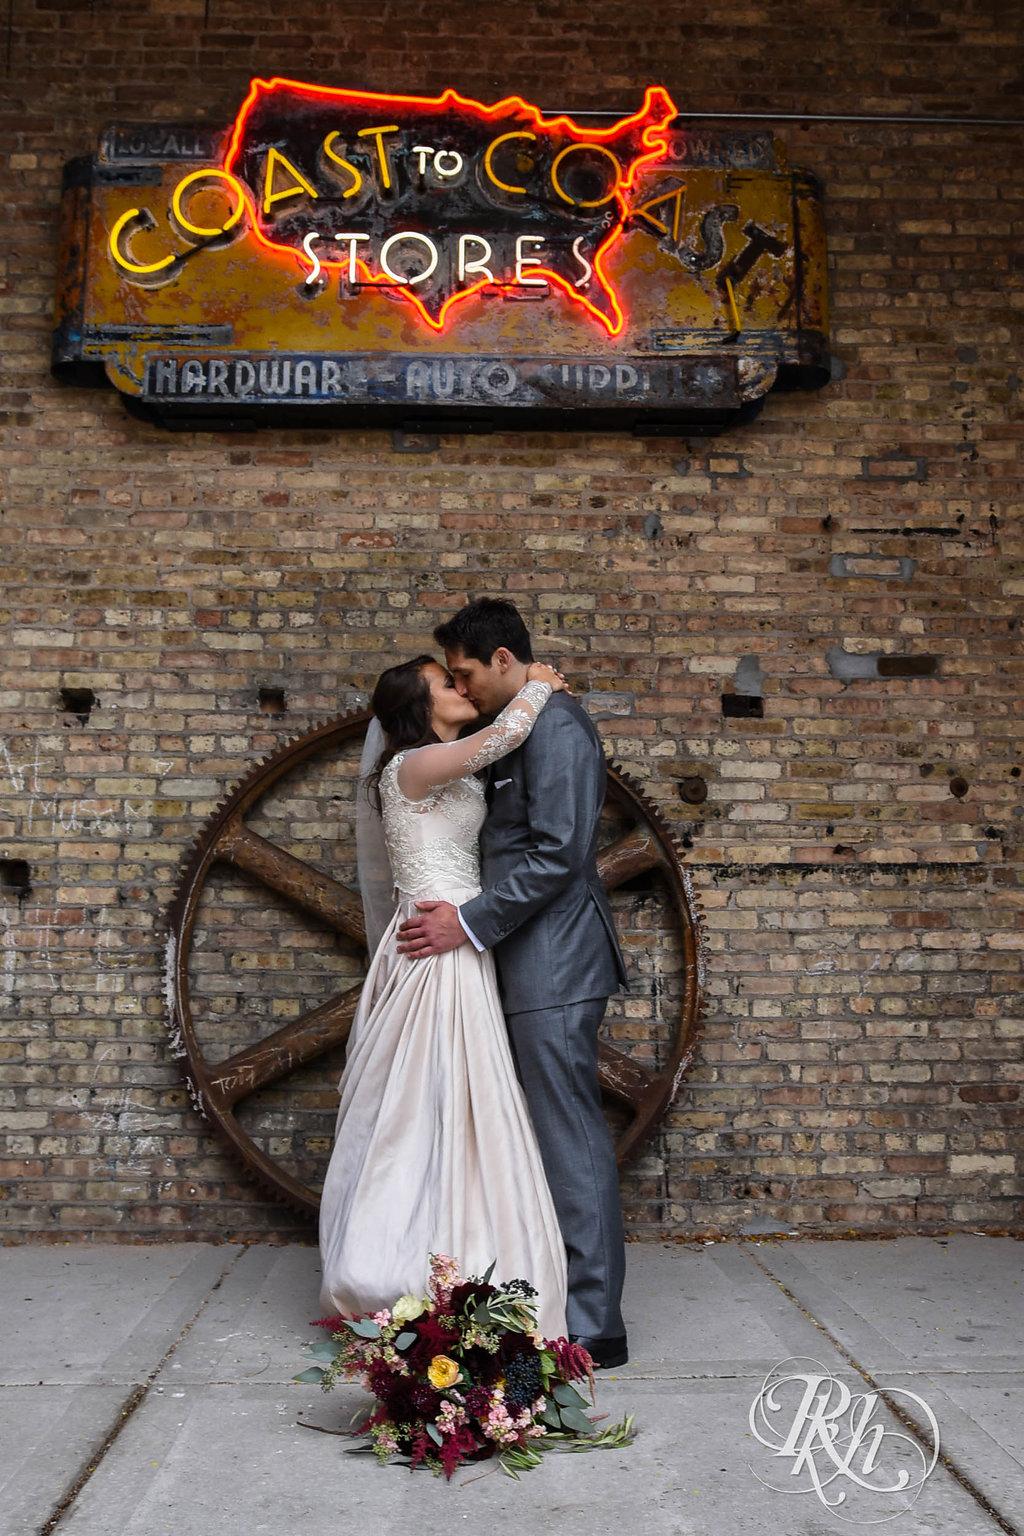 Greta&Paul-MinnesotaWeddingPhotographer-RKHImages(10of29).jpg